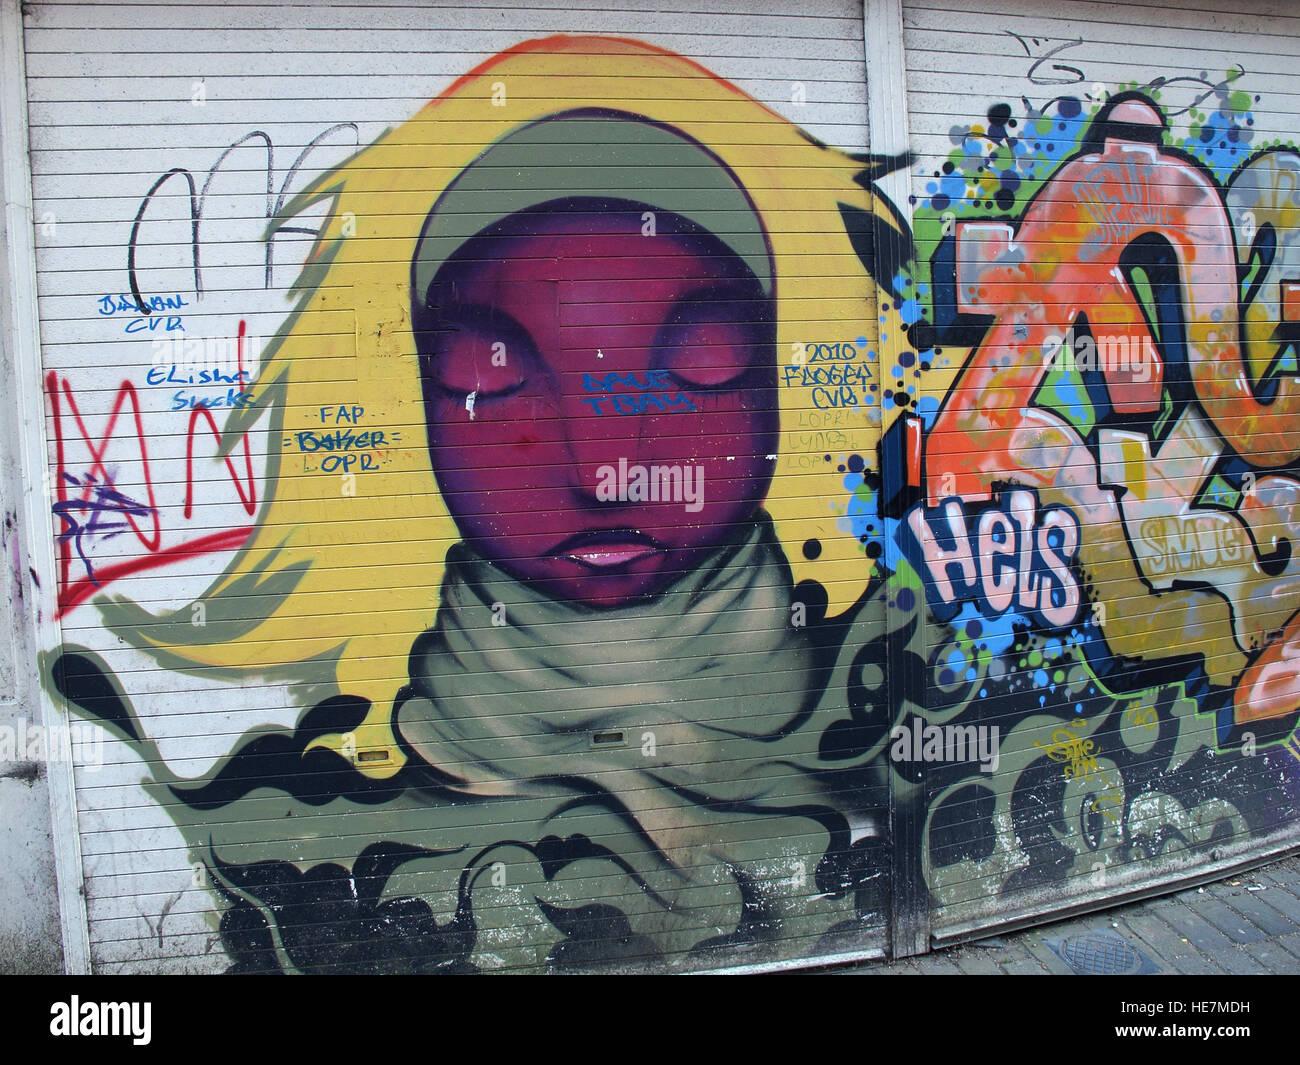 Laden Sie dieses Alamy Stockfoto Belfast Garfield St Graffiti City Centre, Northern Ireland, UK - HE7MDH